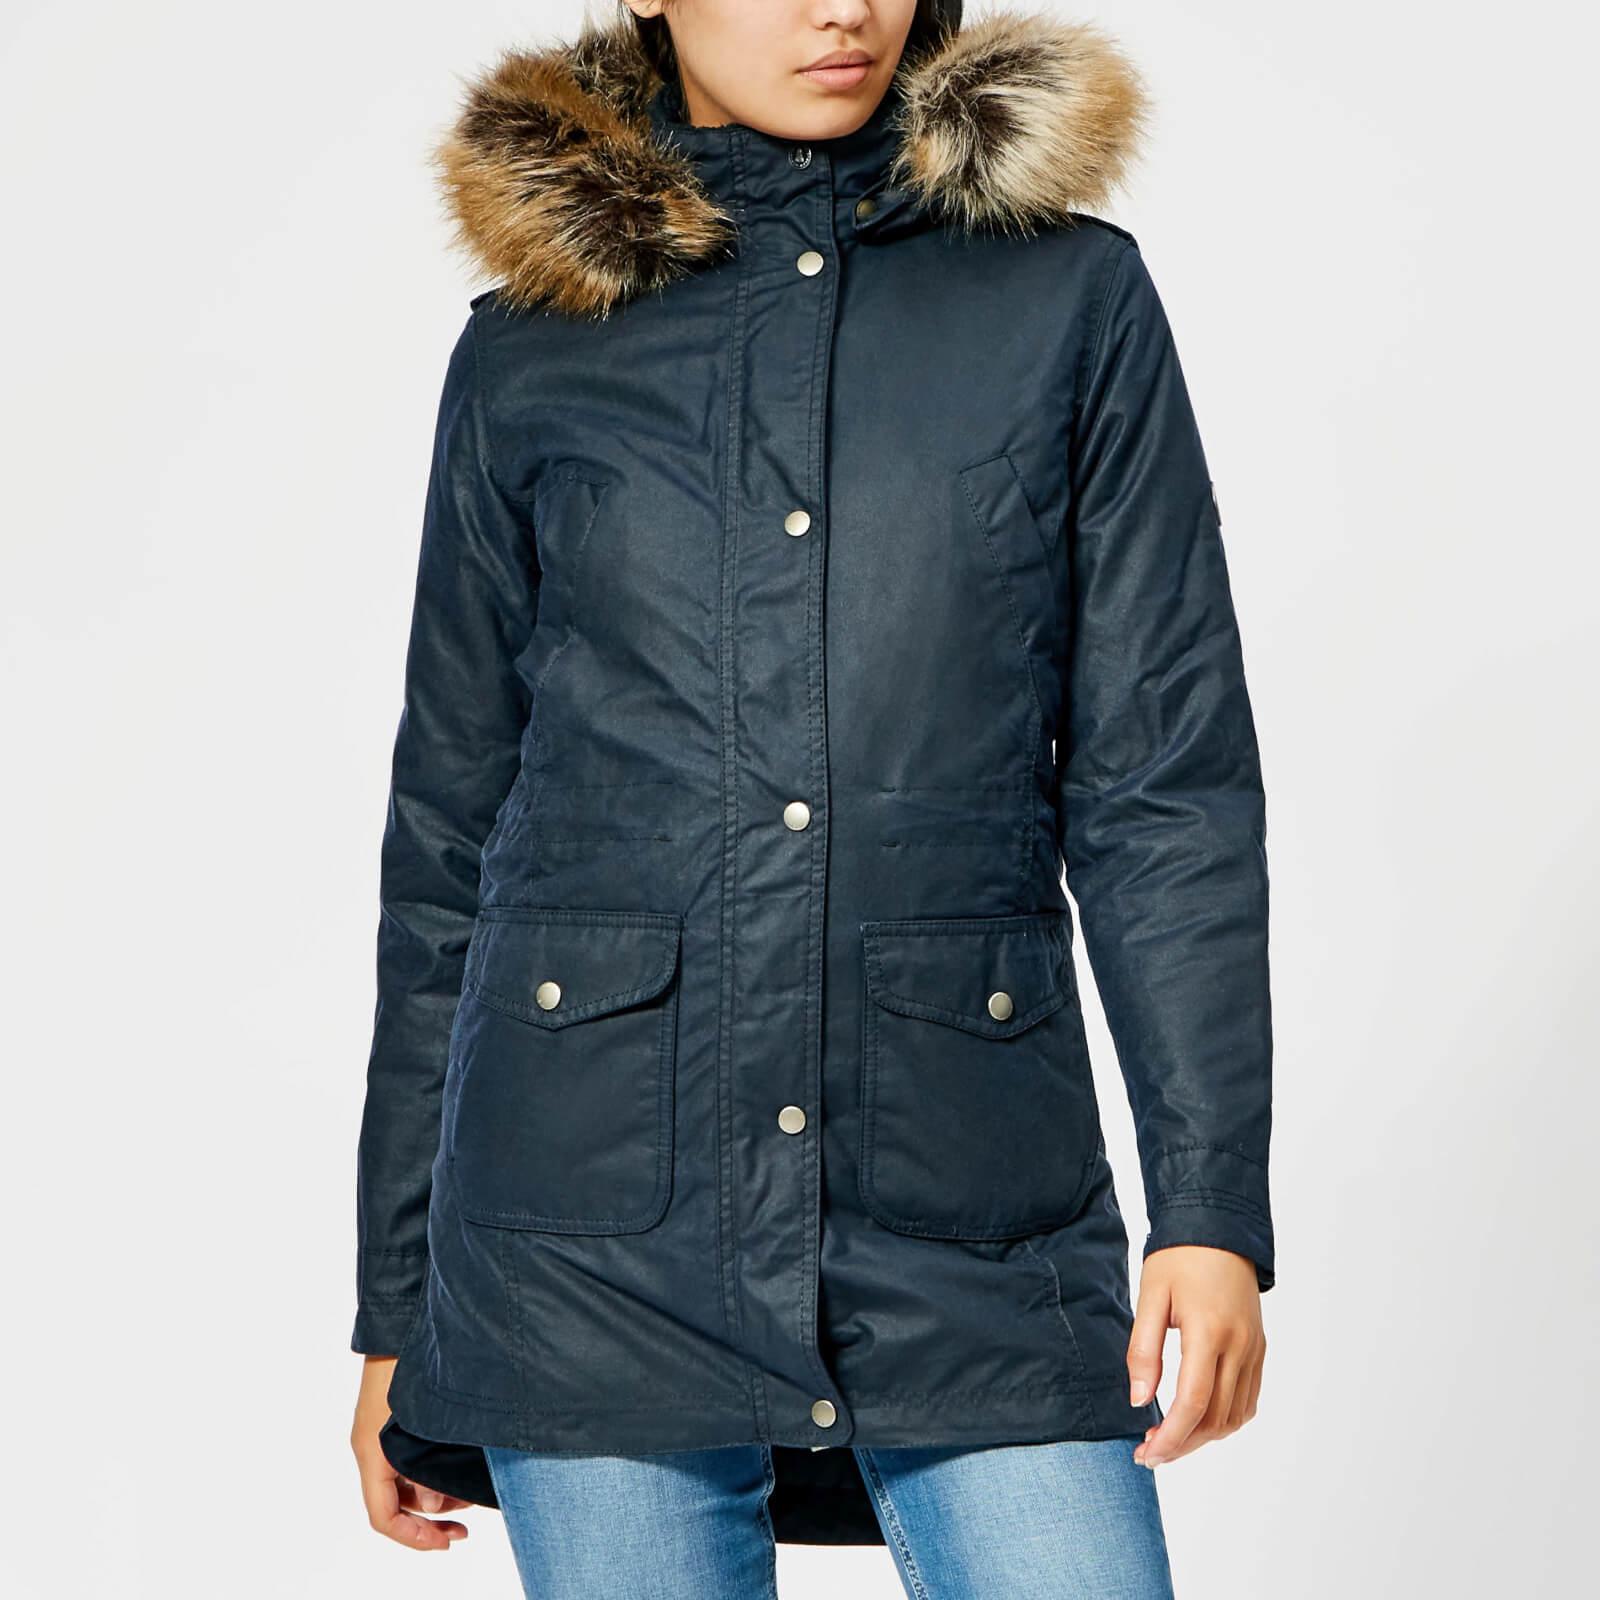 f9dd541cd72 Barbour Women's Bridport Wax Jacket - Royal Navy